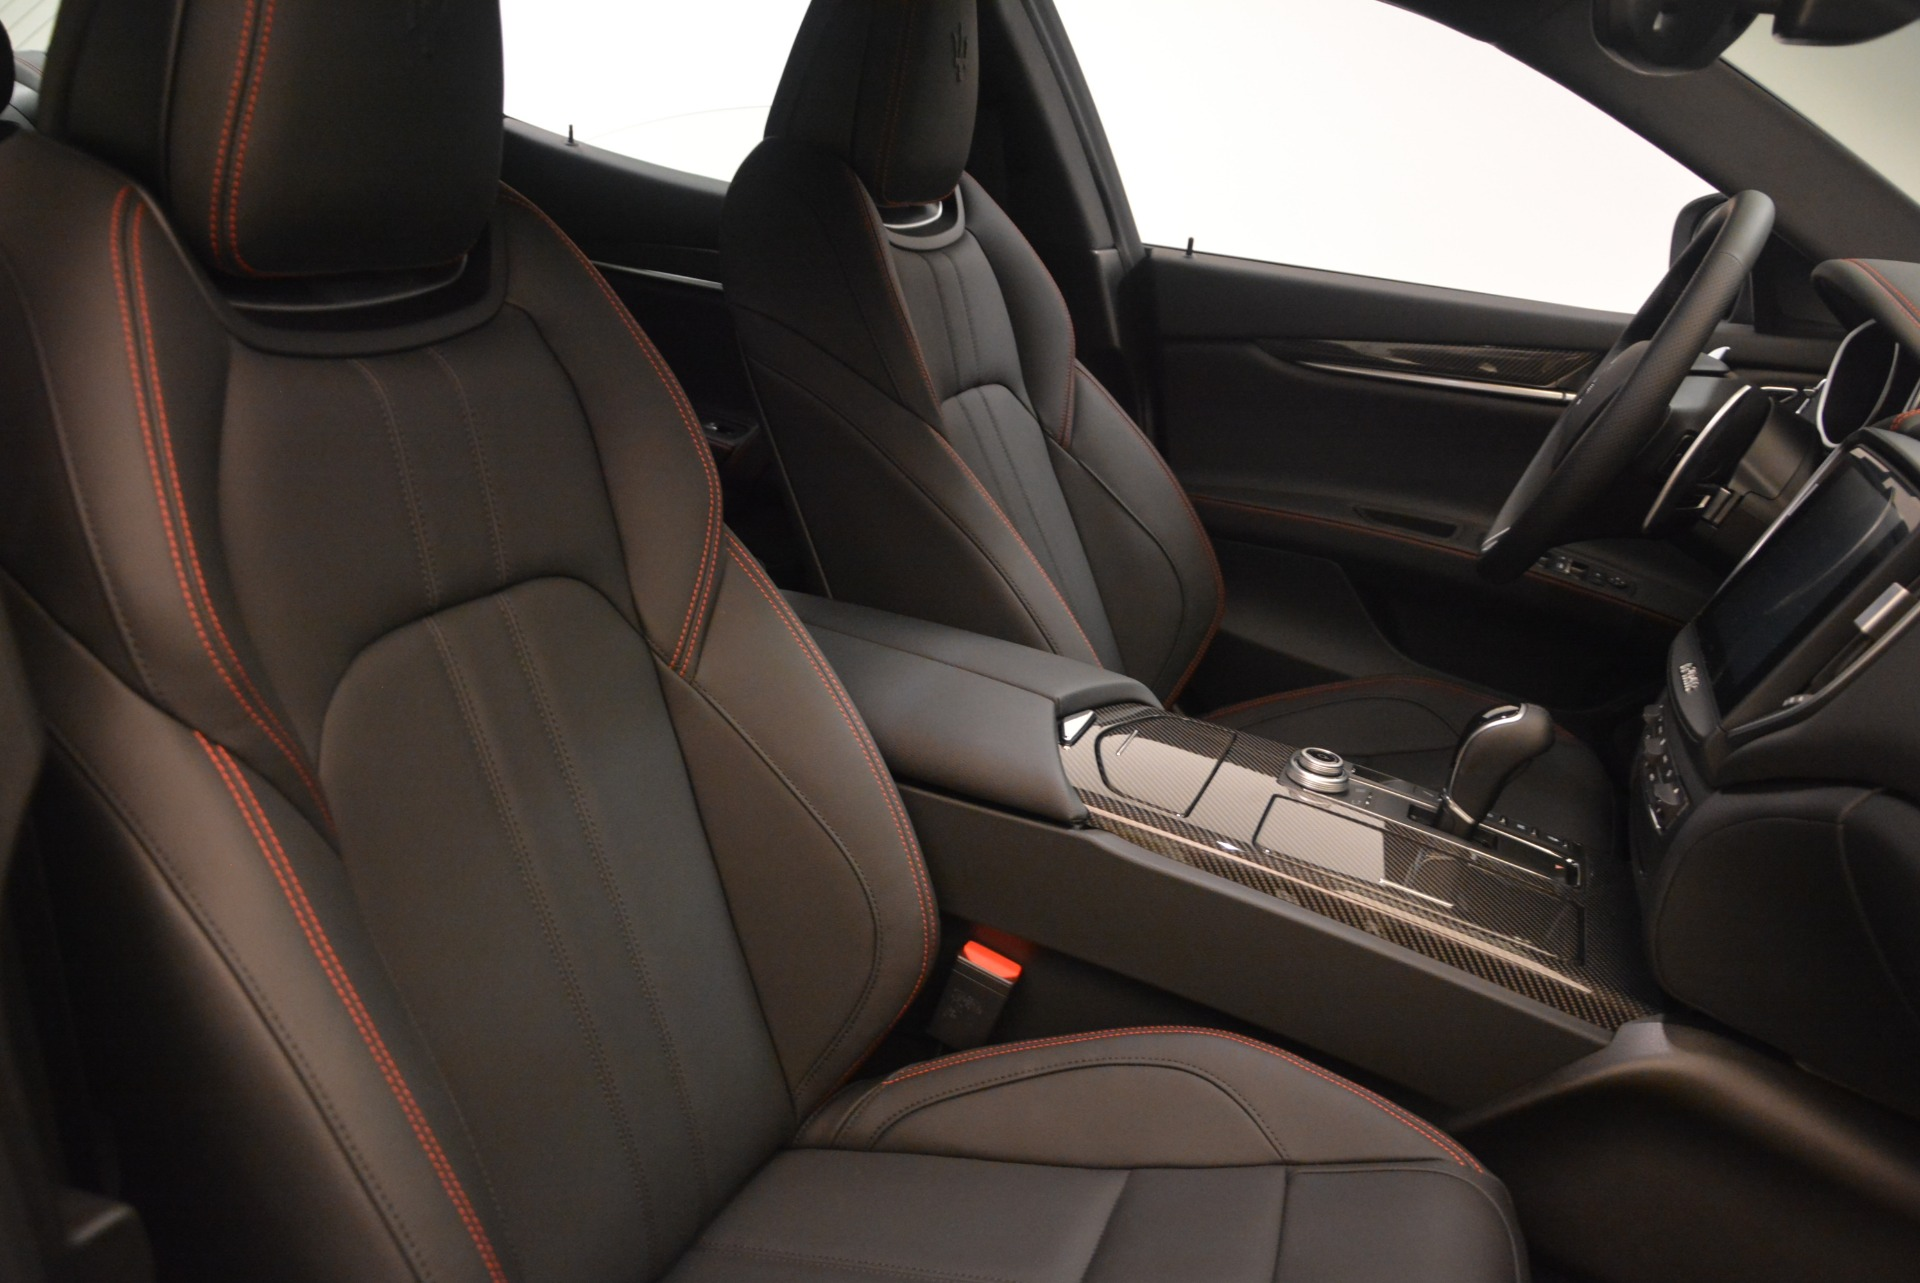 New 2018 Maserati Ghibli SQ4 GranSport Nerissimo For Sale In Westport, CT 2366_p17